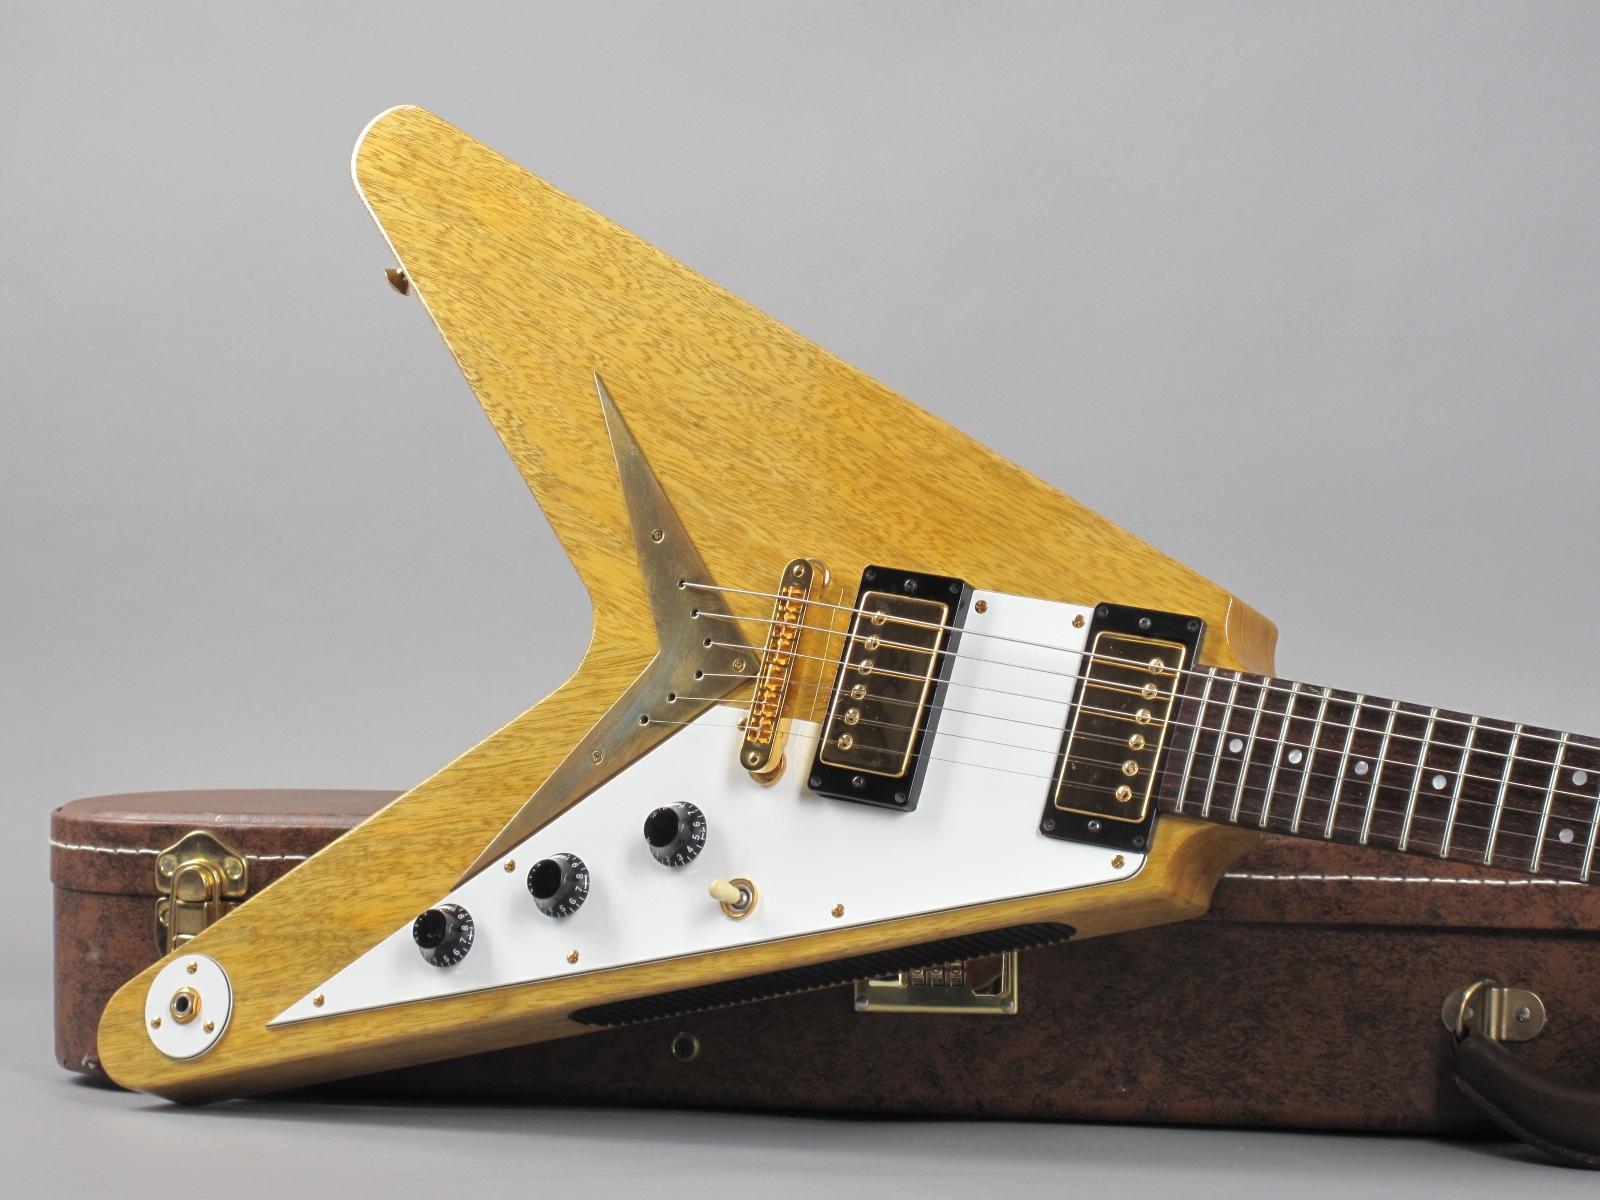 https://guitarpoint.de/app/uploads/products/1997-hamer-vector-korina-limited-edition-58-72/1997-Hamer-Vector-Korina-058_19.jpg